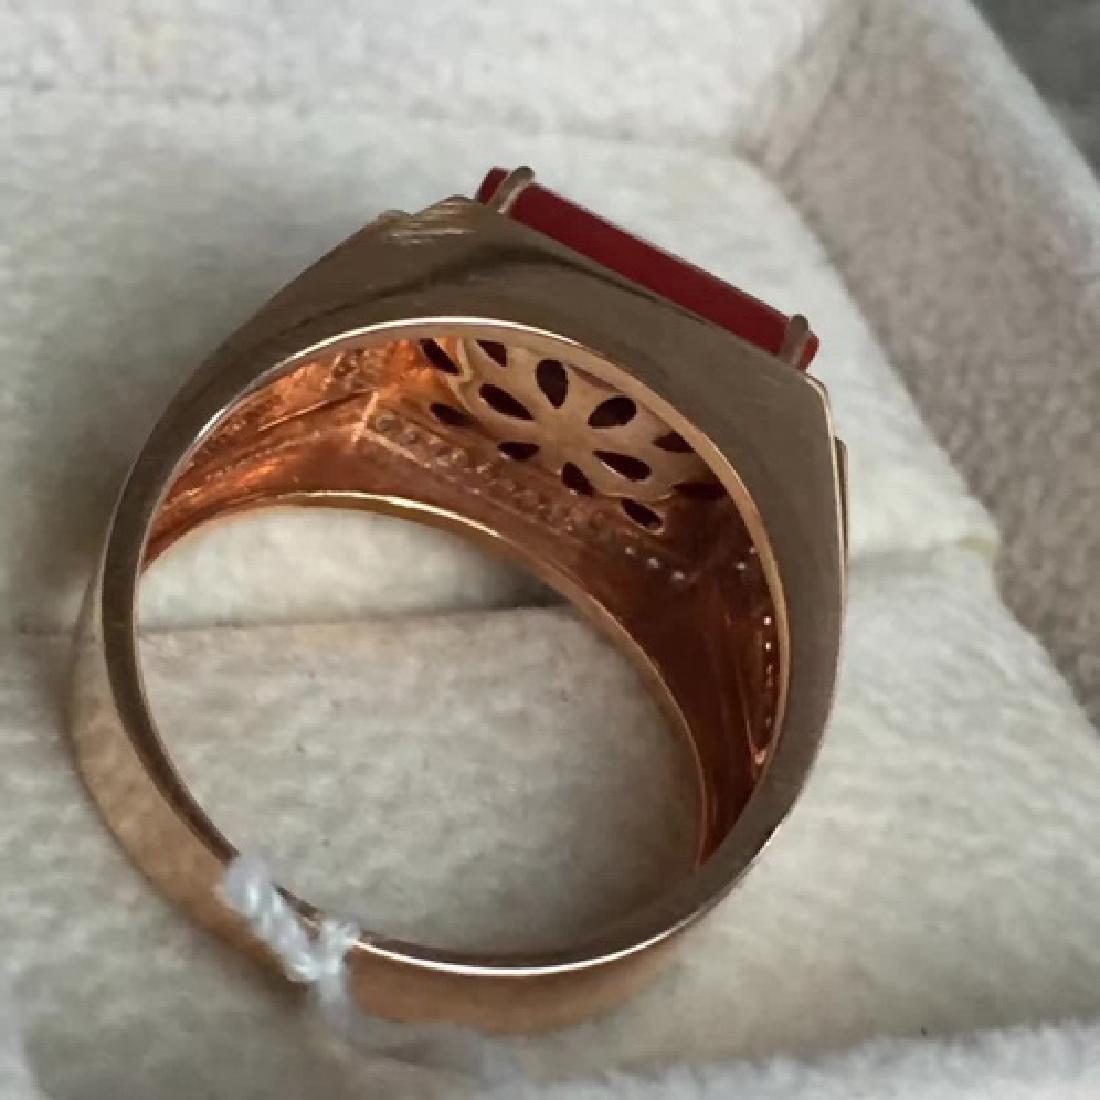 18K AKA MALE RING WITH DIAMOND - 5